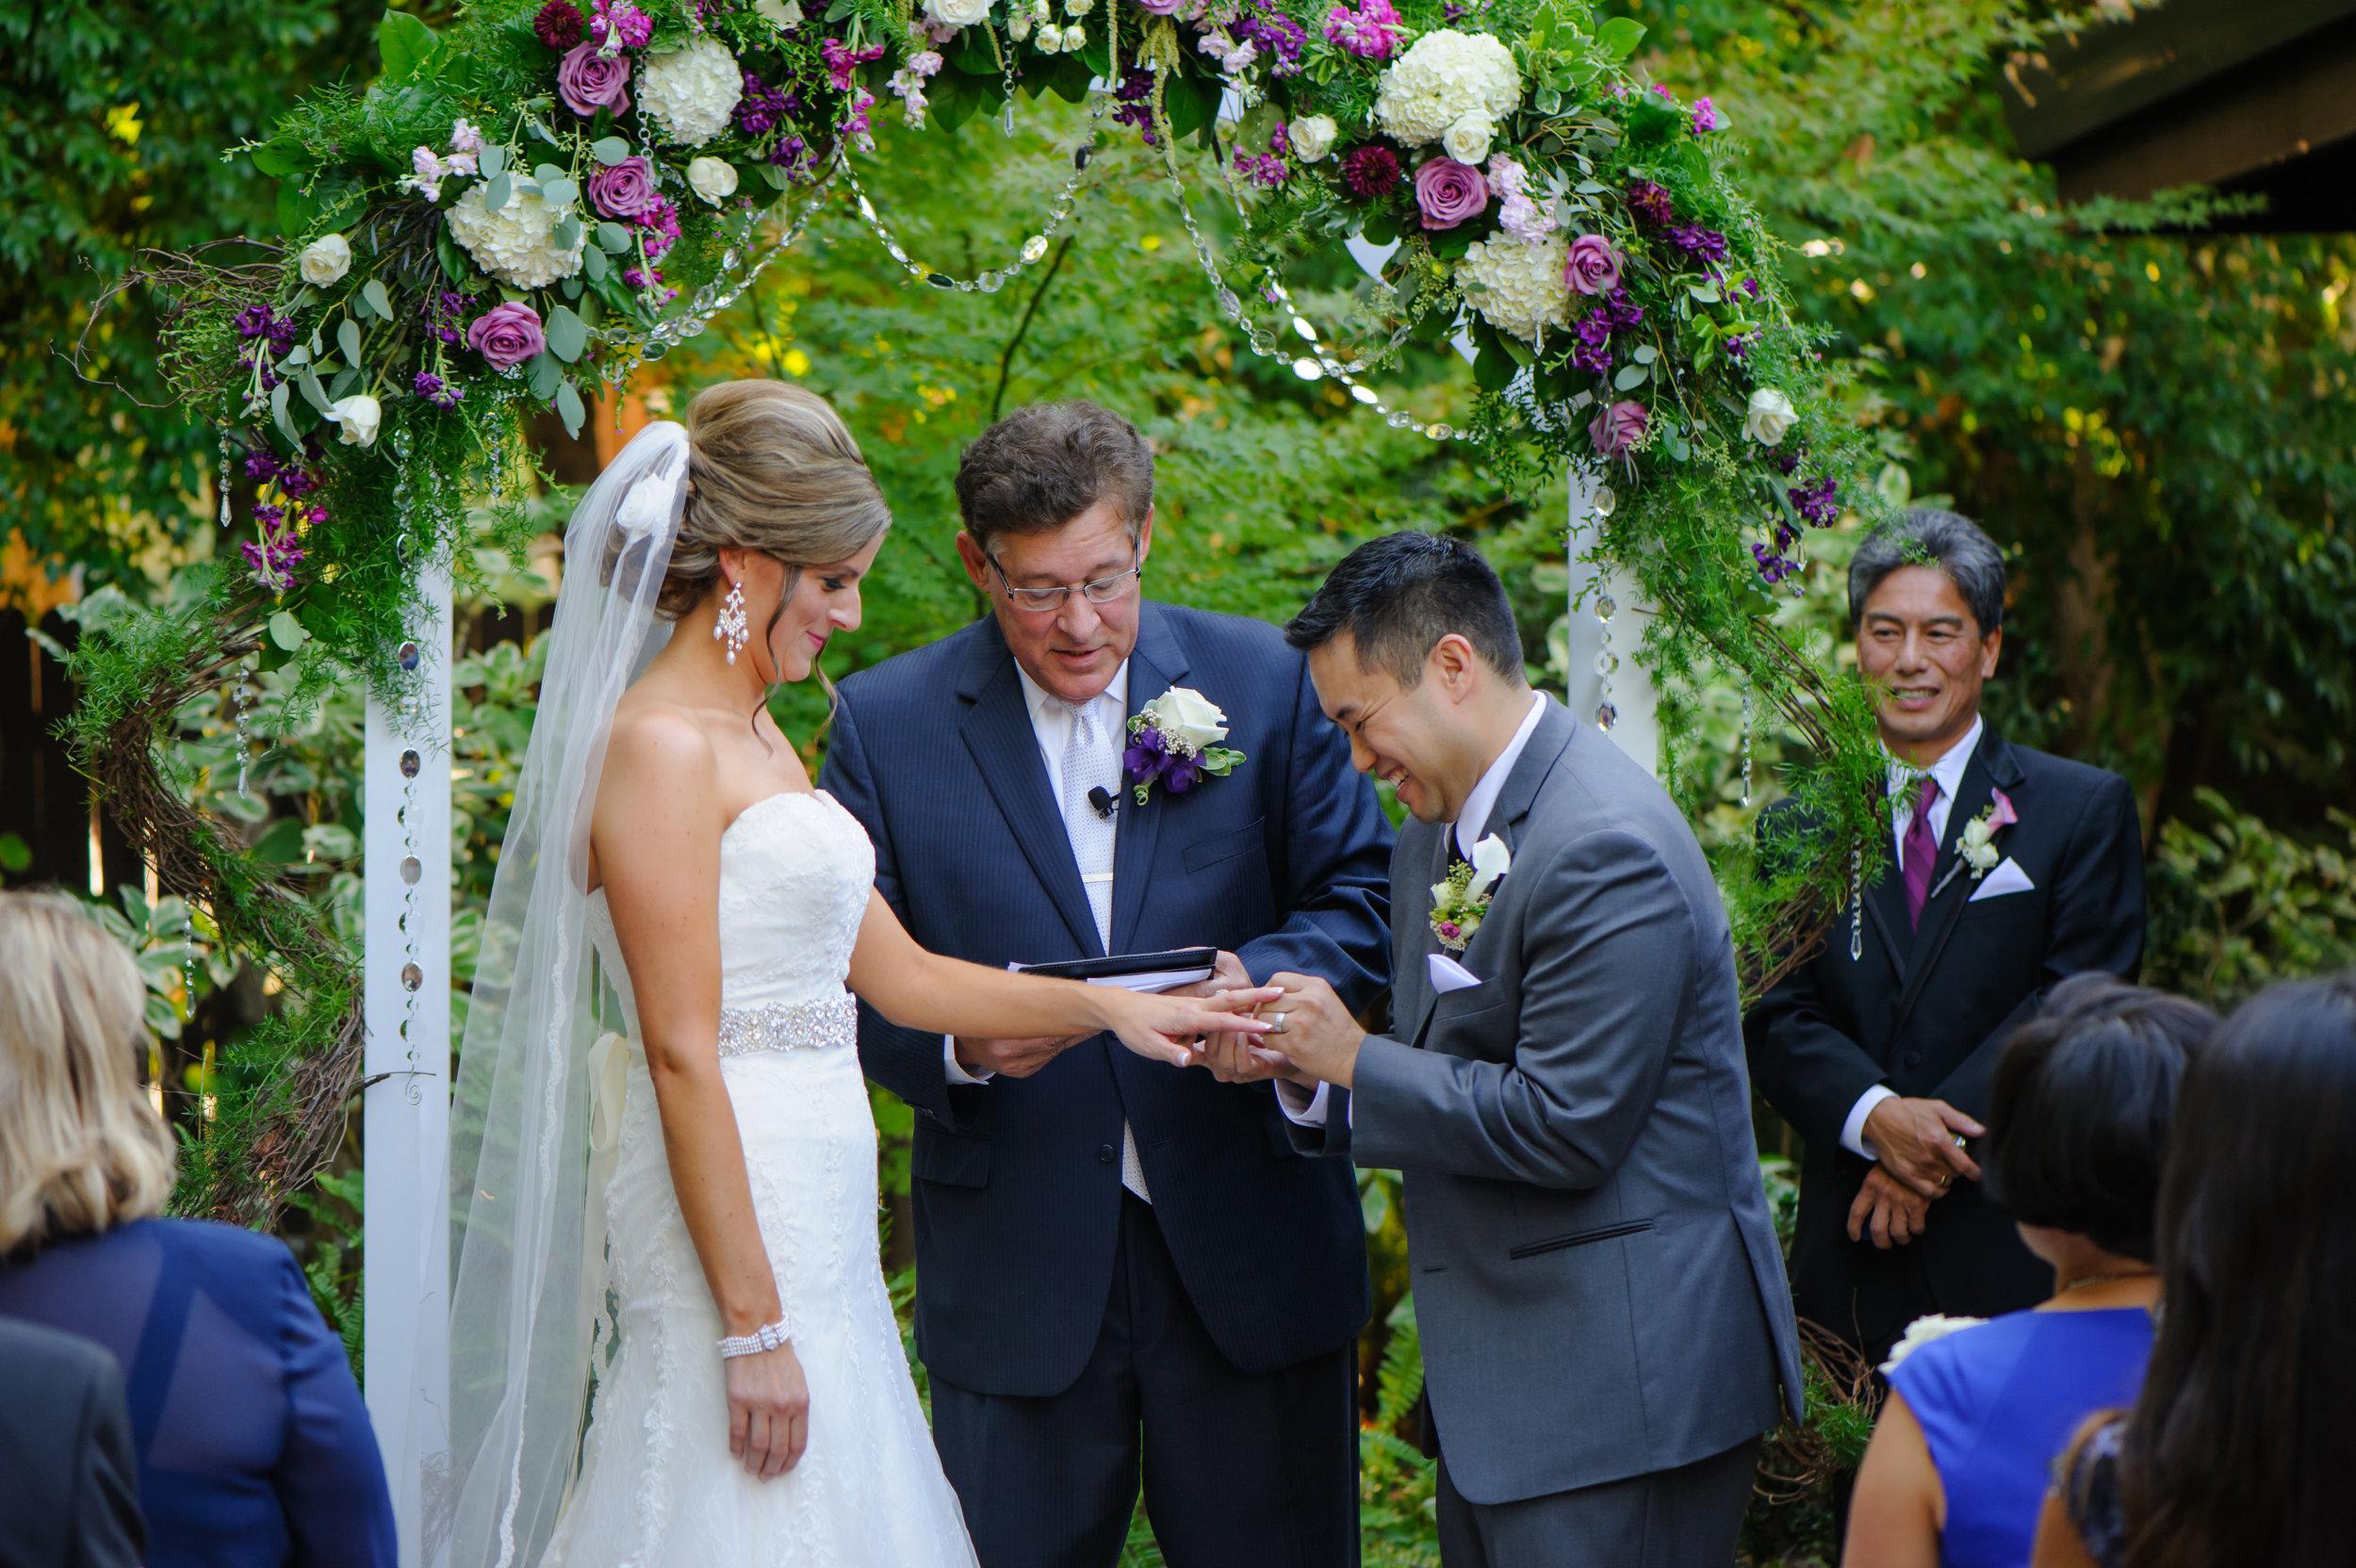 susan-brad-018-sacramento-wedding-photographer-katherine-nicole-photography.JPG